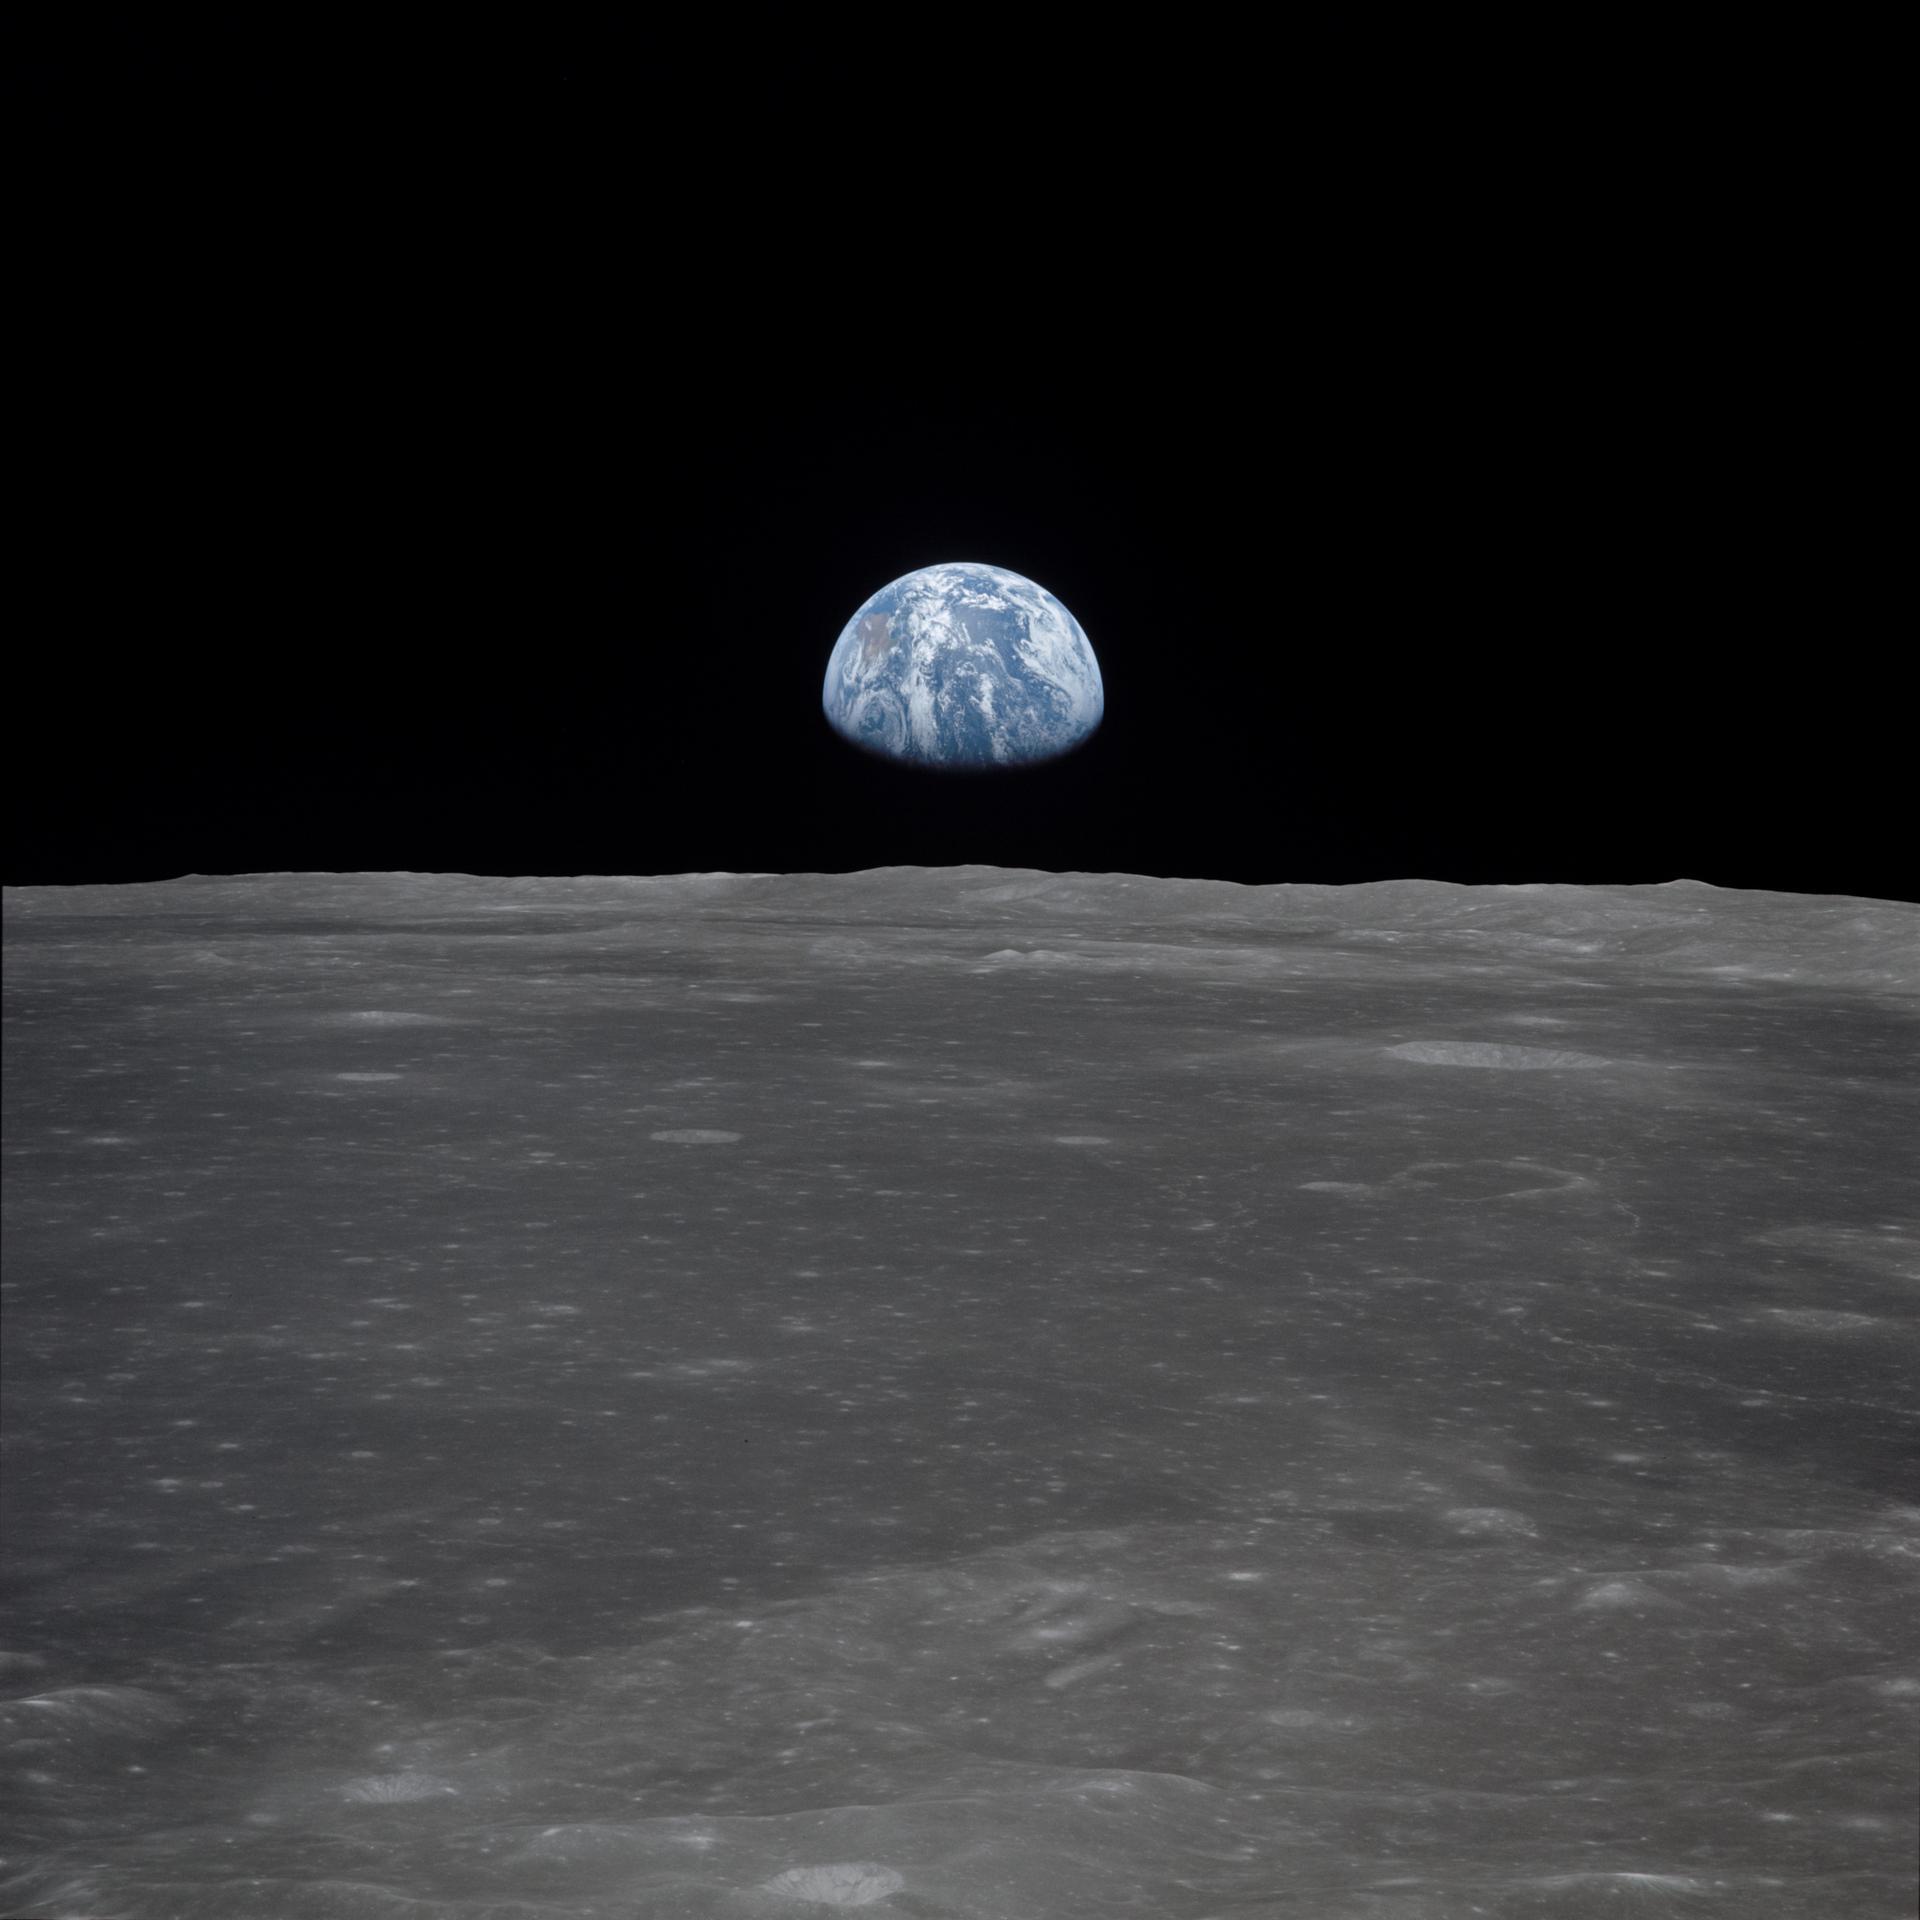 APOLLO 11 - PHOTO EARTH FROM MOON.jpg